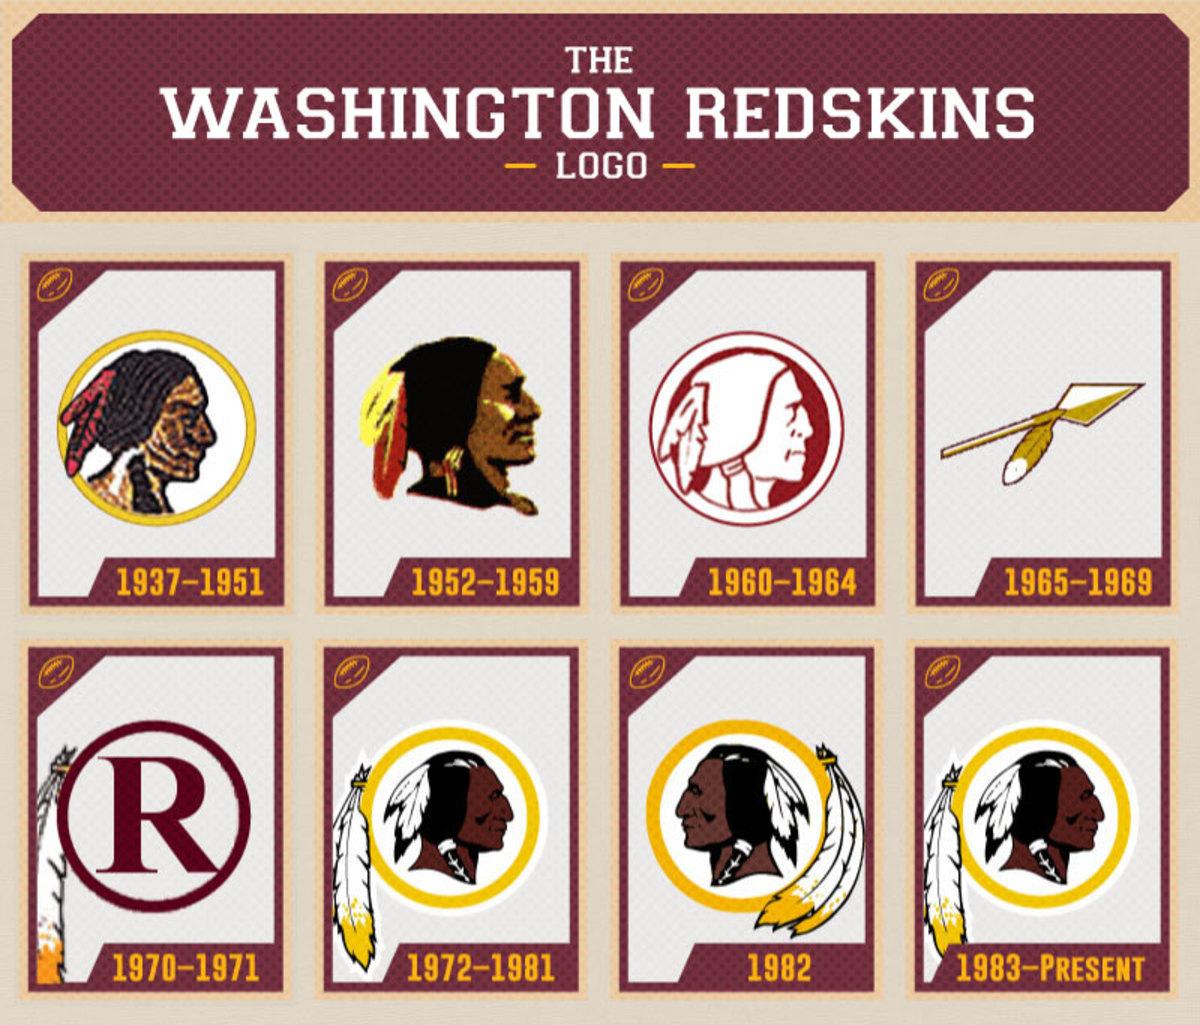 In 1988, the Washington Redskins won the Super Bowl.